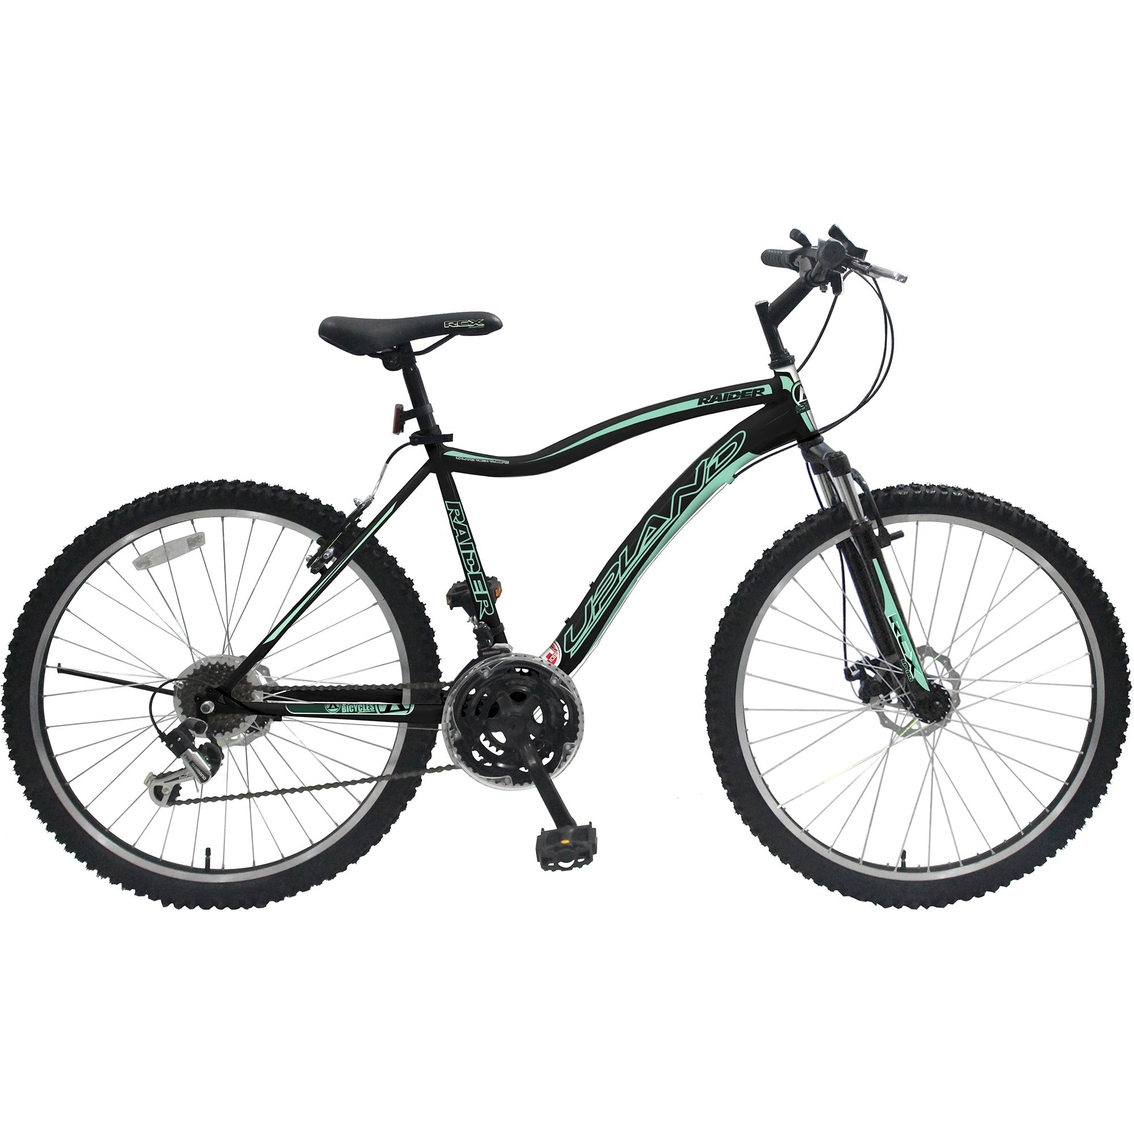 upland women s 27 5 in raider mountain bike adult bikes sports Bose FM Tuner upland women s 27 5 in raider mountain bike